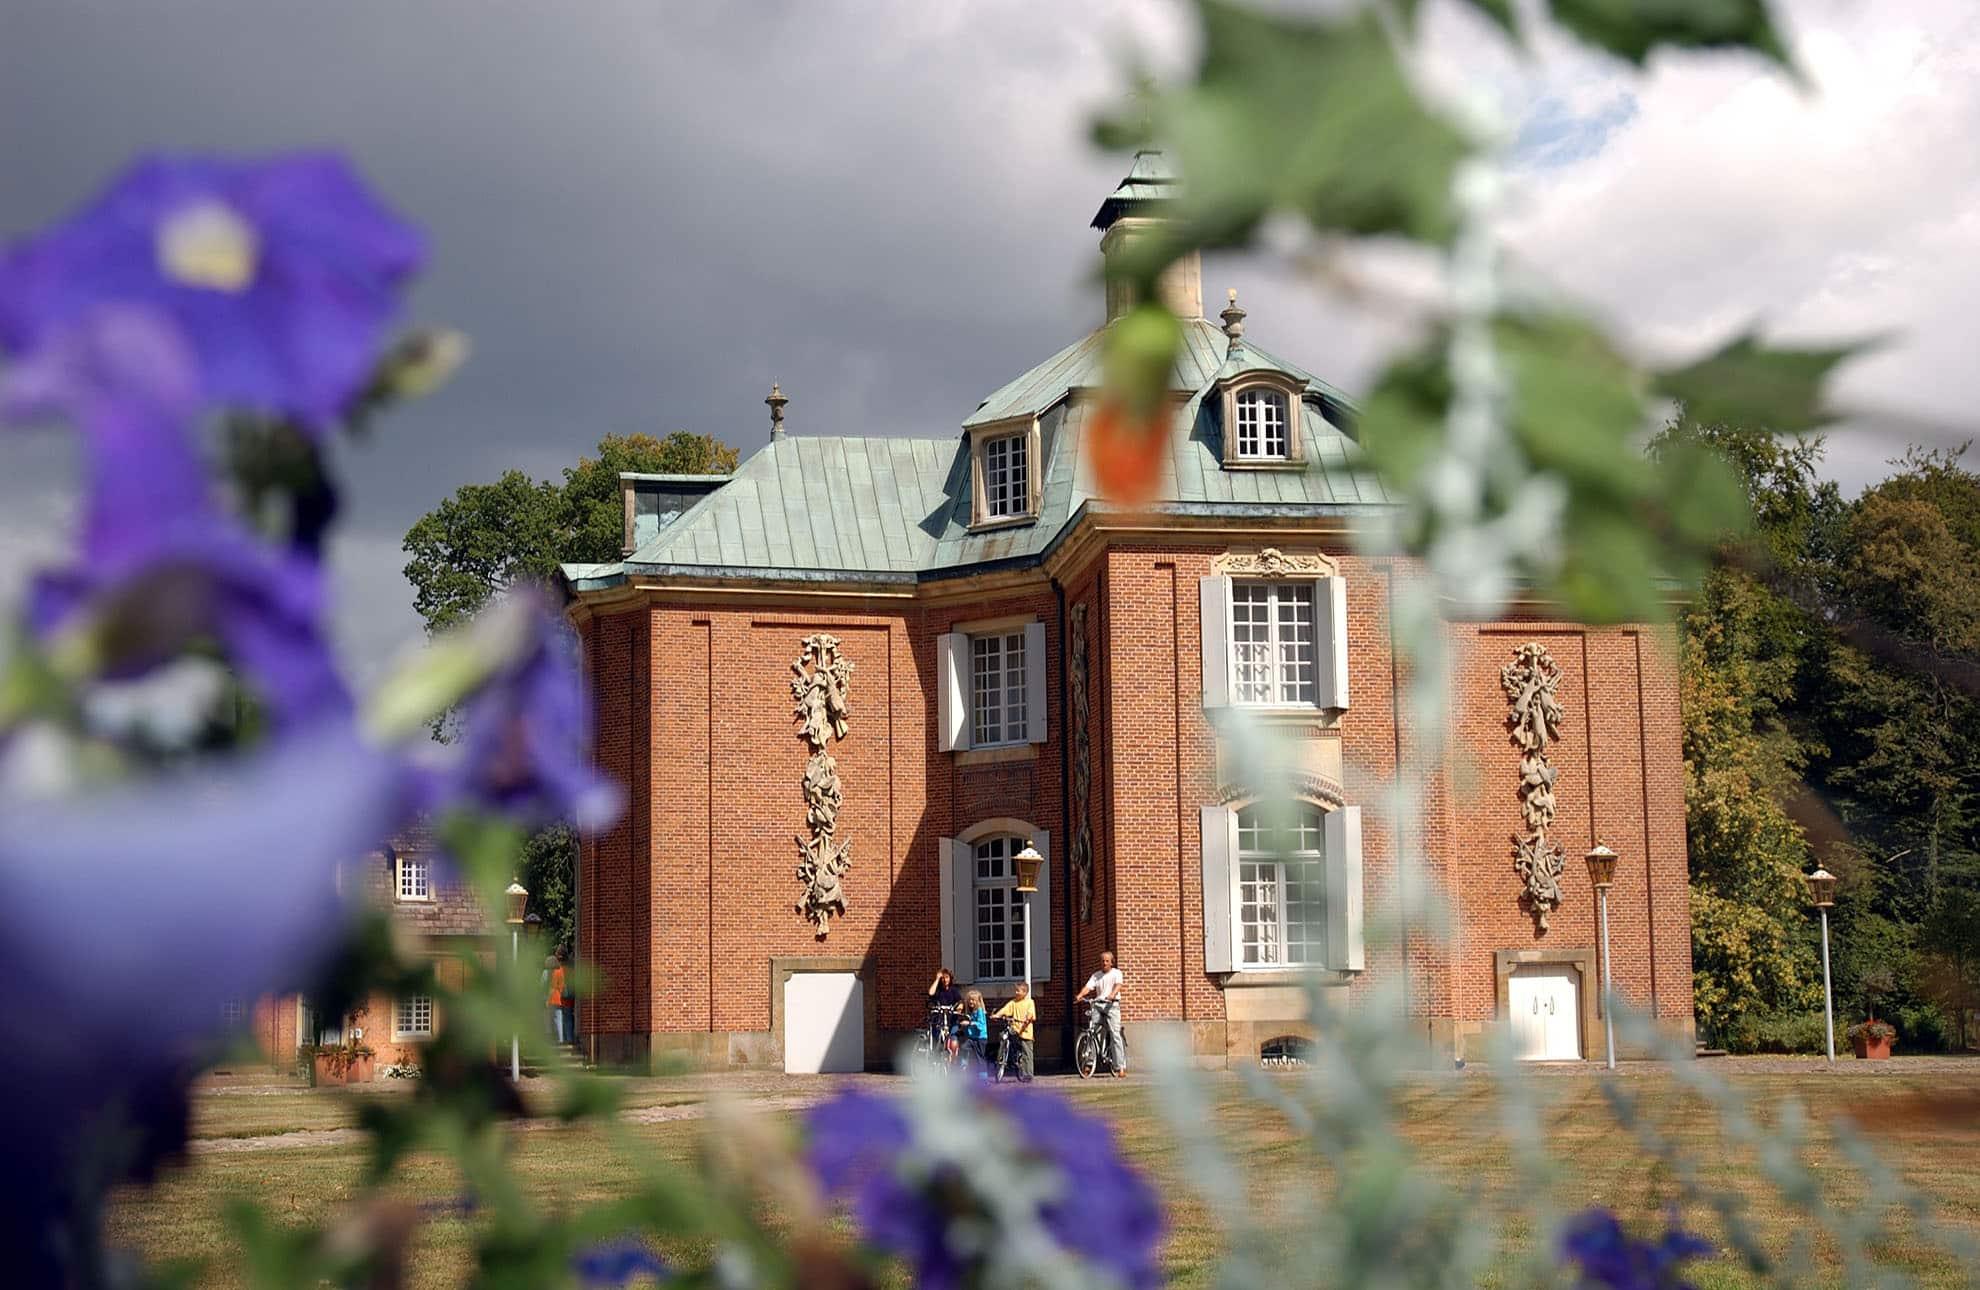 Familotel Gut Landegge Umgebung Schloss Clemenswerth Perle des Emslandes